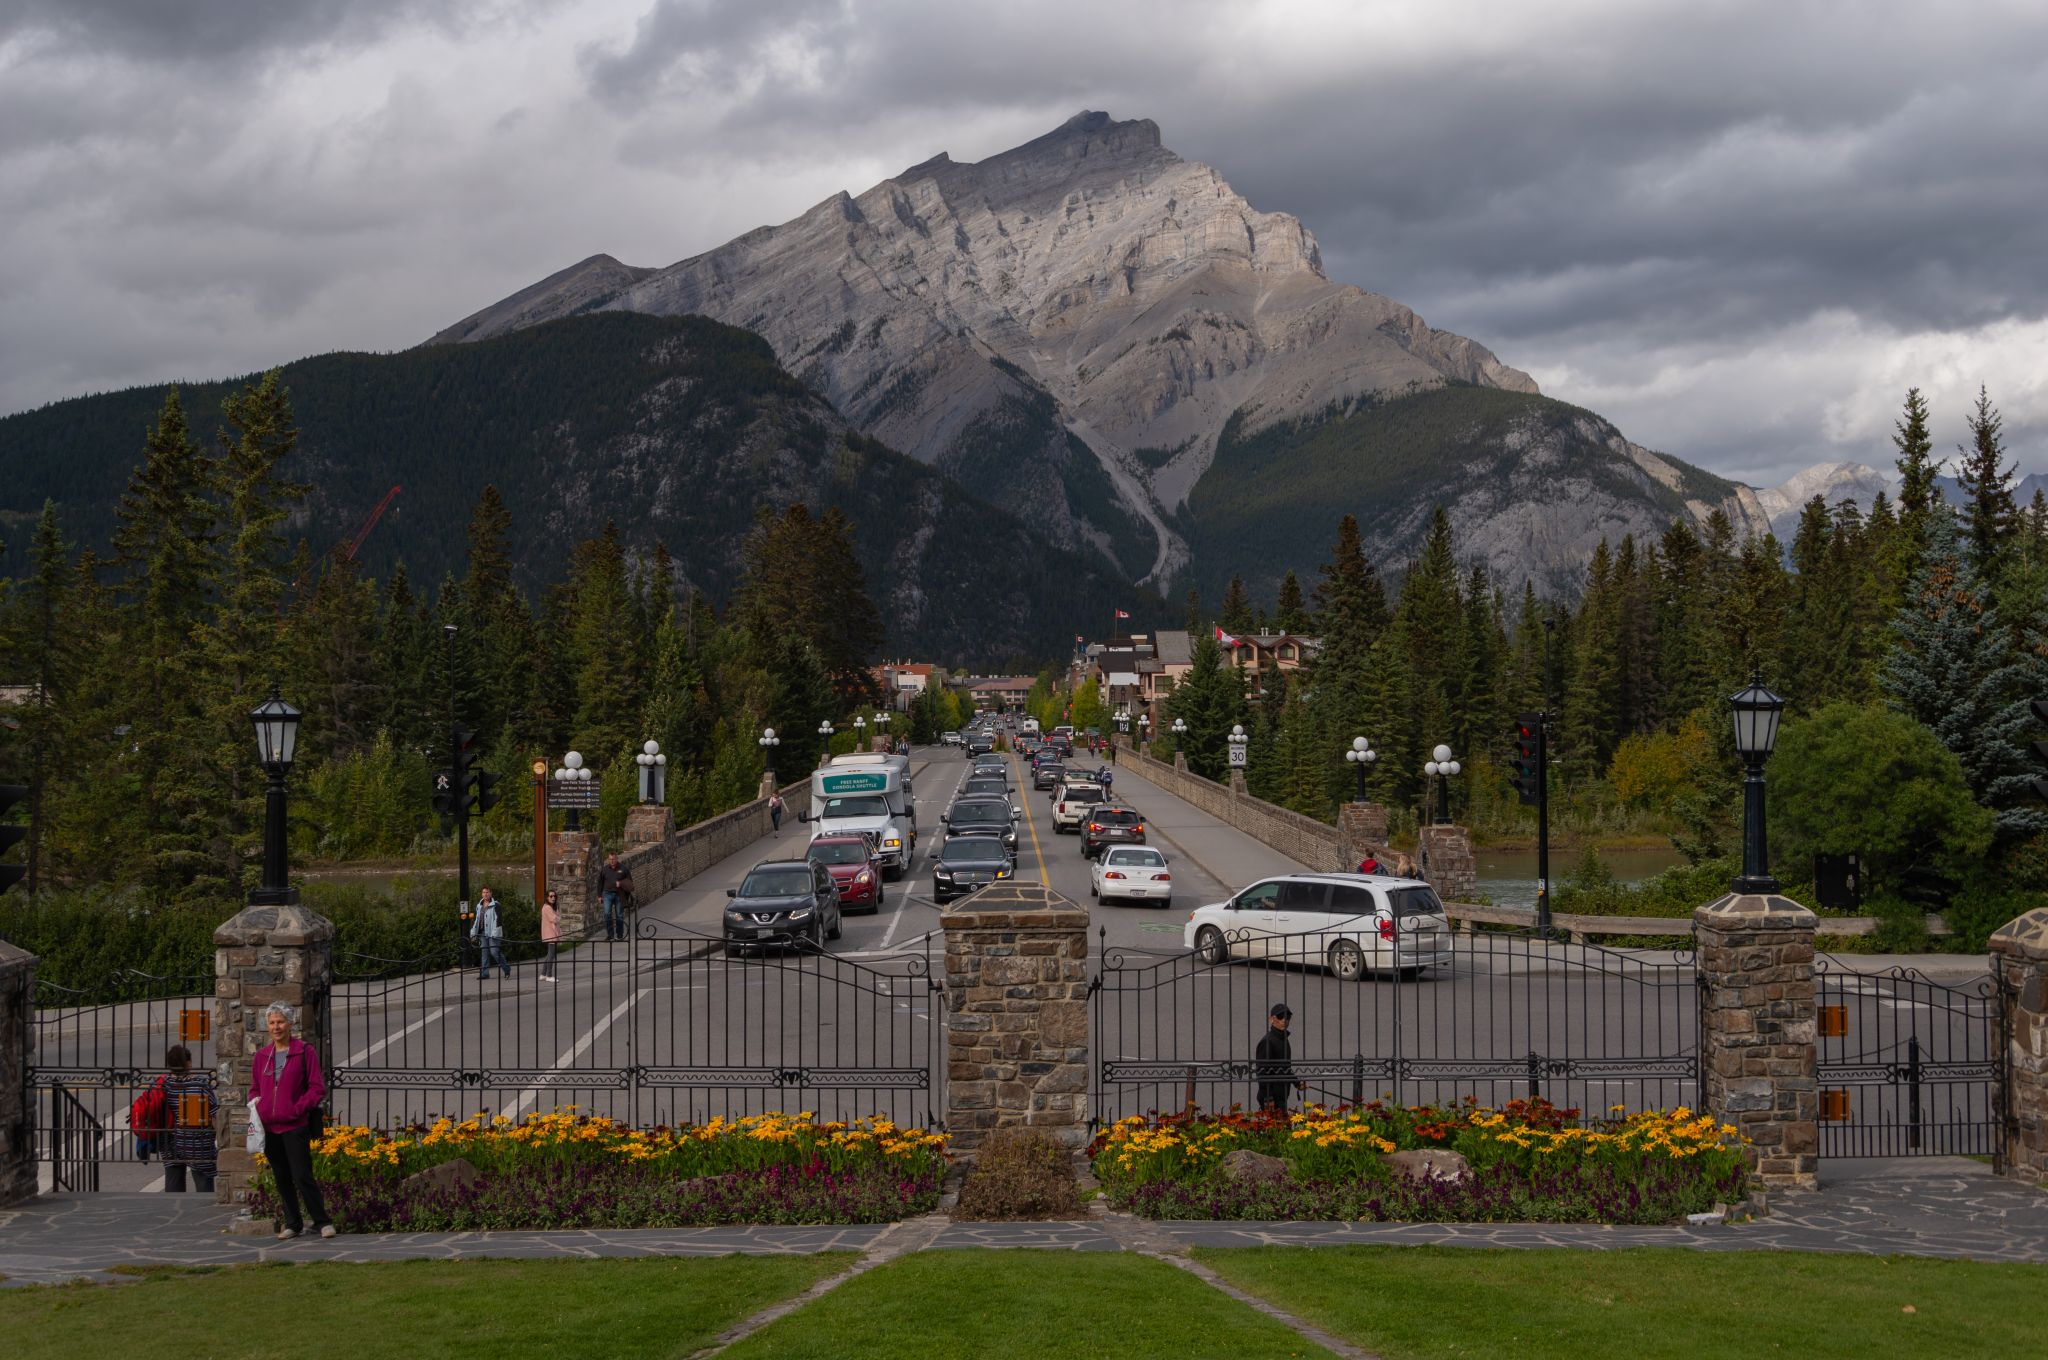 Banff National Park Administrative Building, Canada